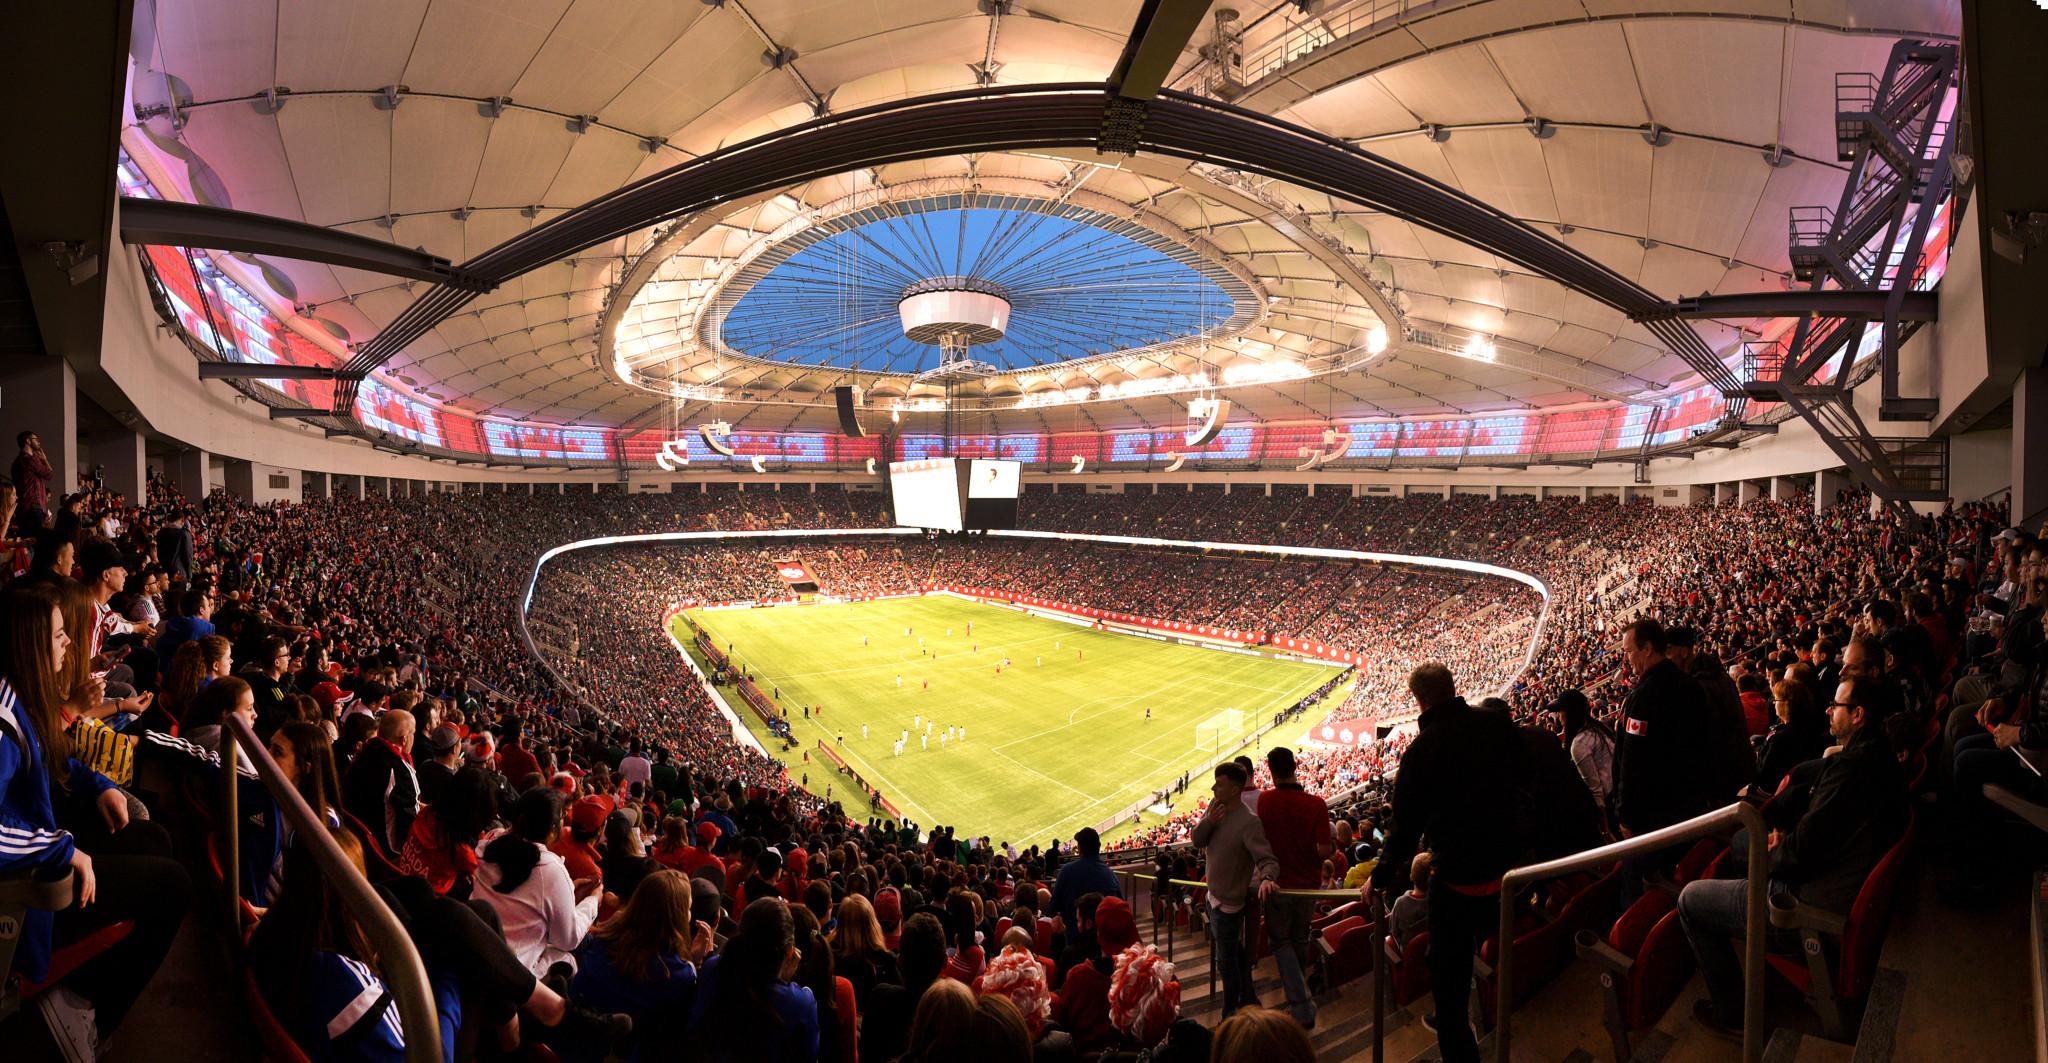 Image: Bob Frid / Canada Soccer